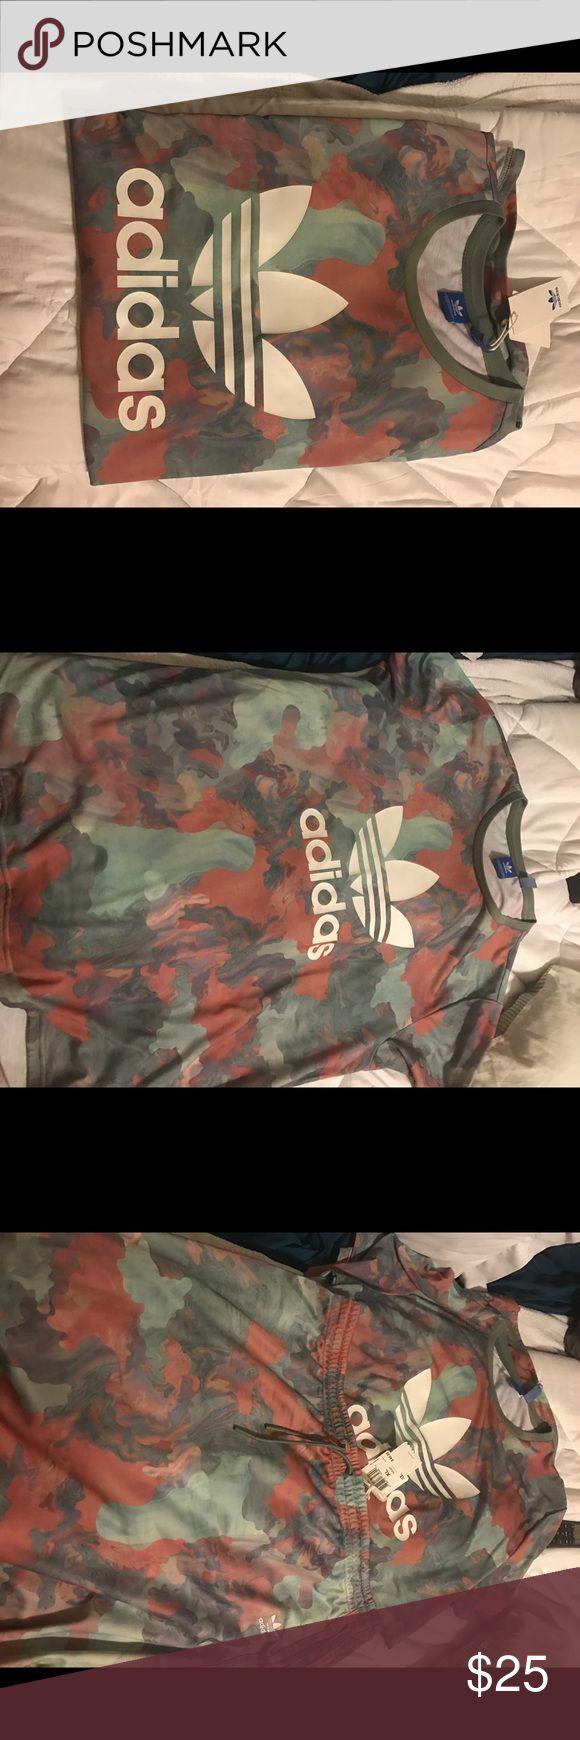 Women's Adidas camo pastel shirt sz XL Women's Adidas camo pastel shirt sz XL short sleeve! Soft stretch! Comfy and cute! Tops Tees - Short Sleeve